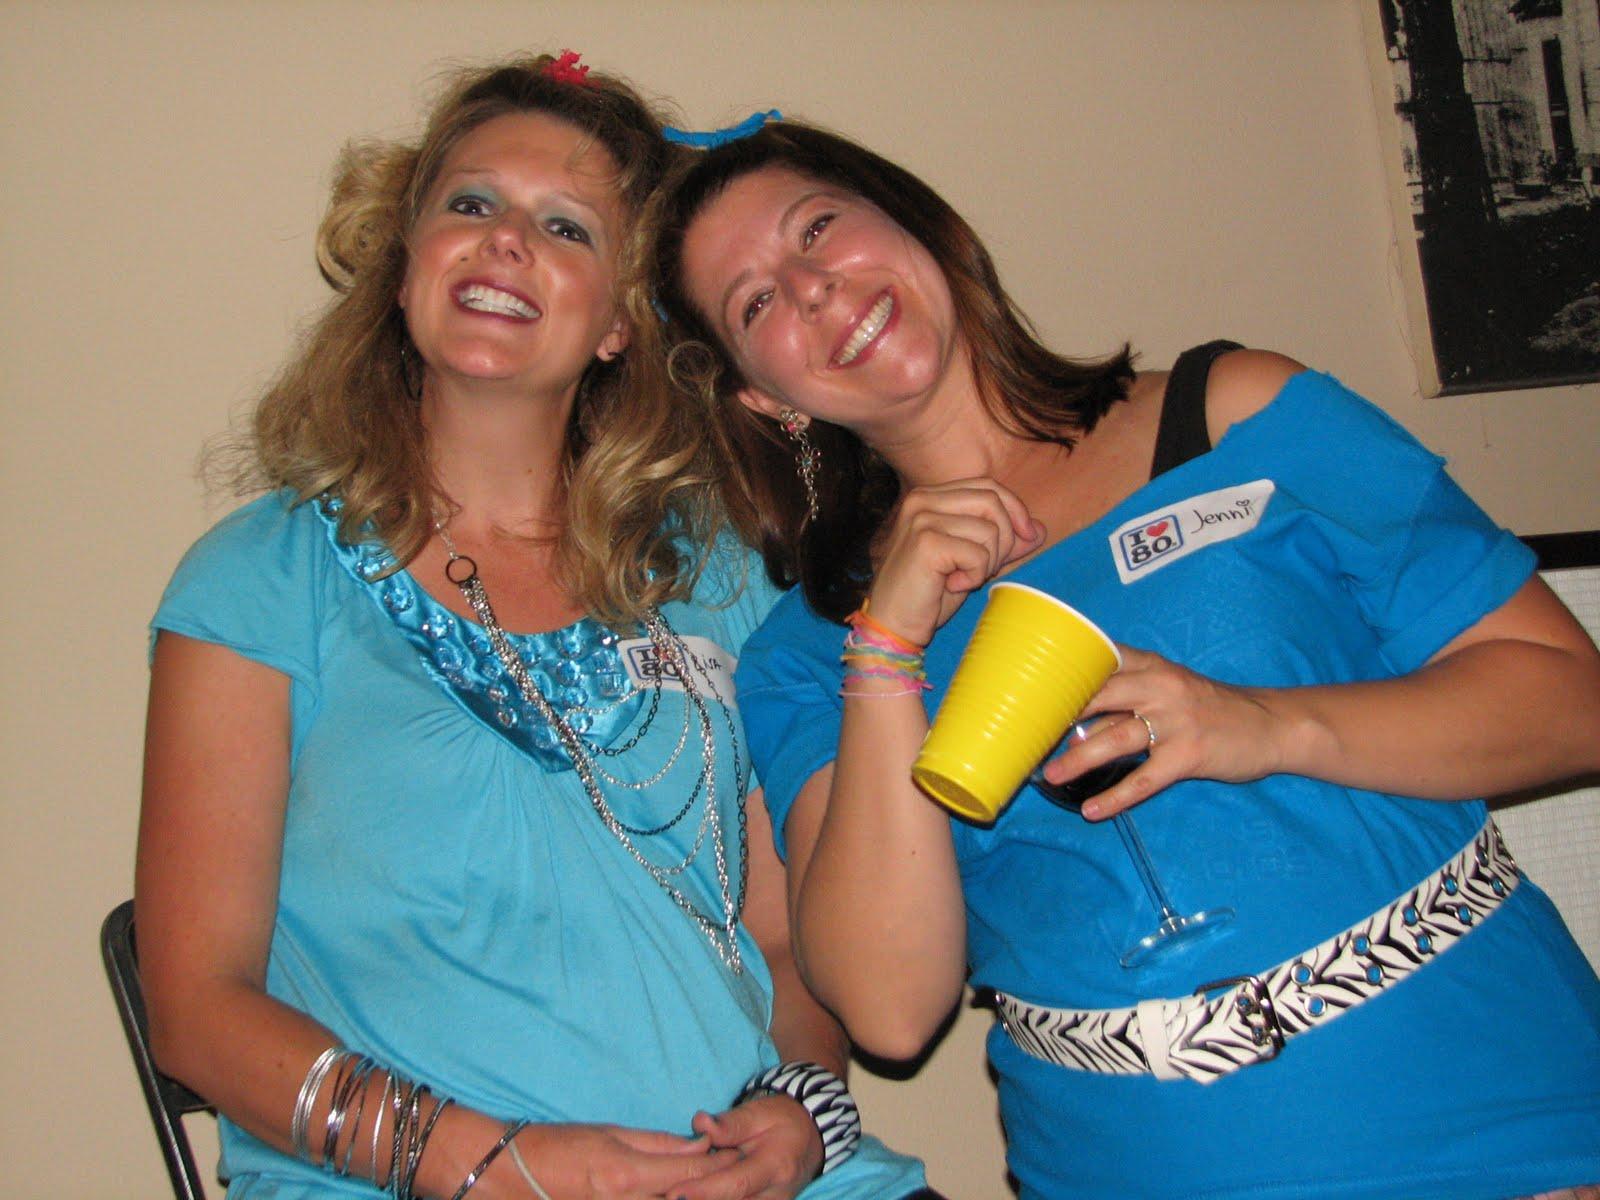 Luxury Dress 80s Party Image - All Wedding Dresses - kreplicawatches.com